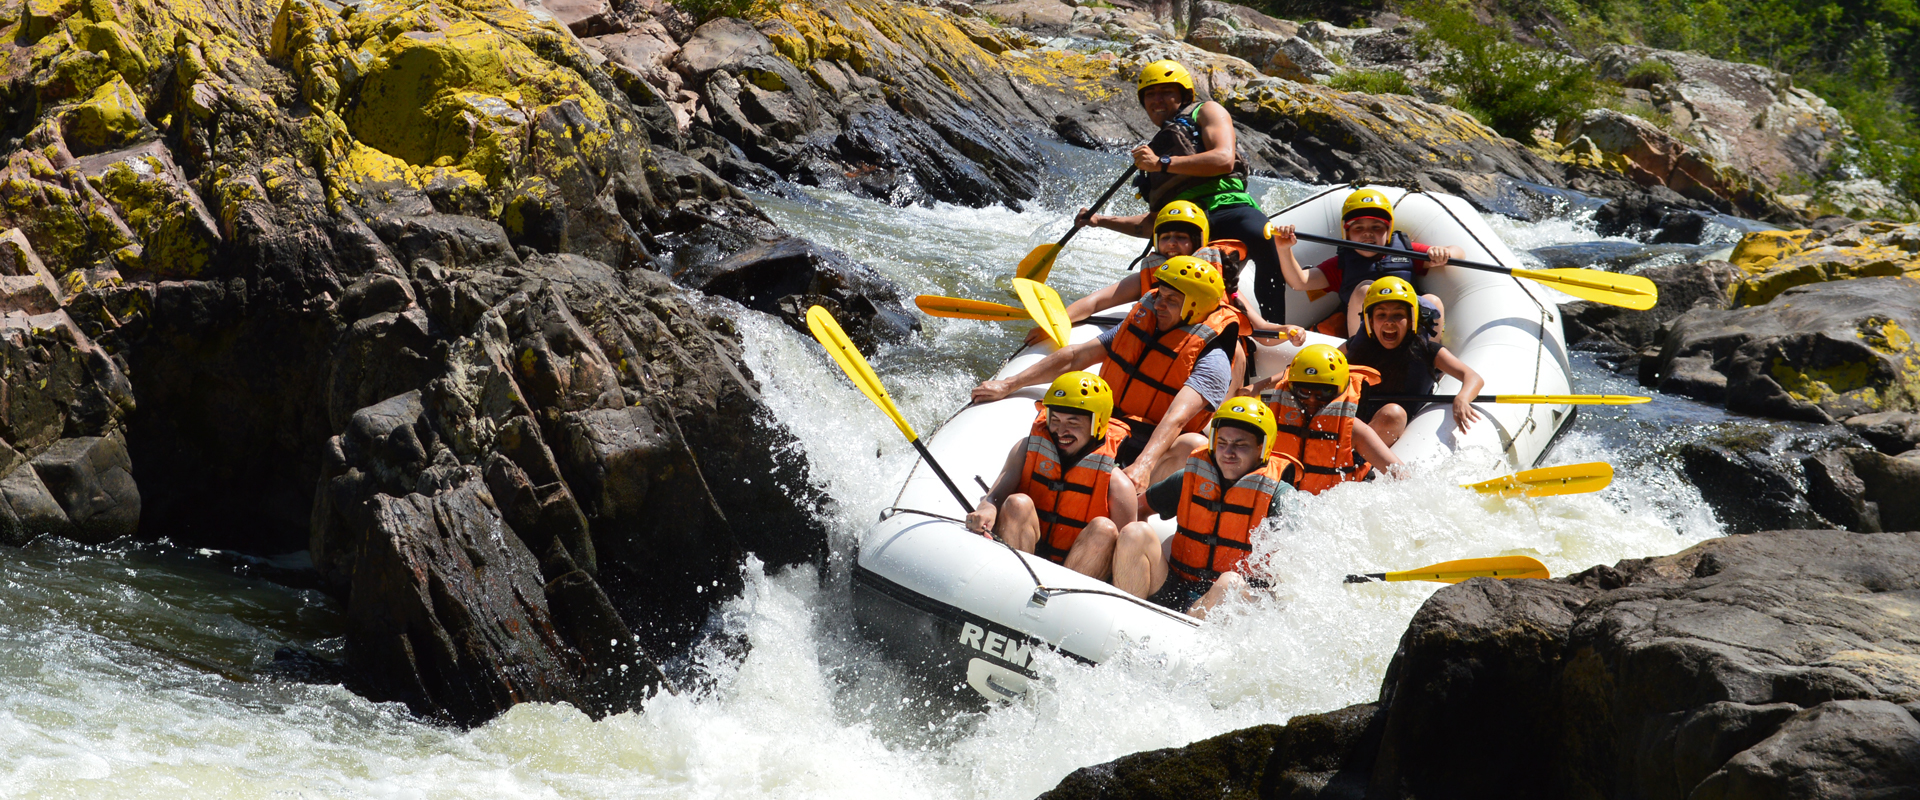 Rafting com a Tartarugas